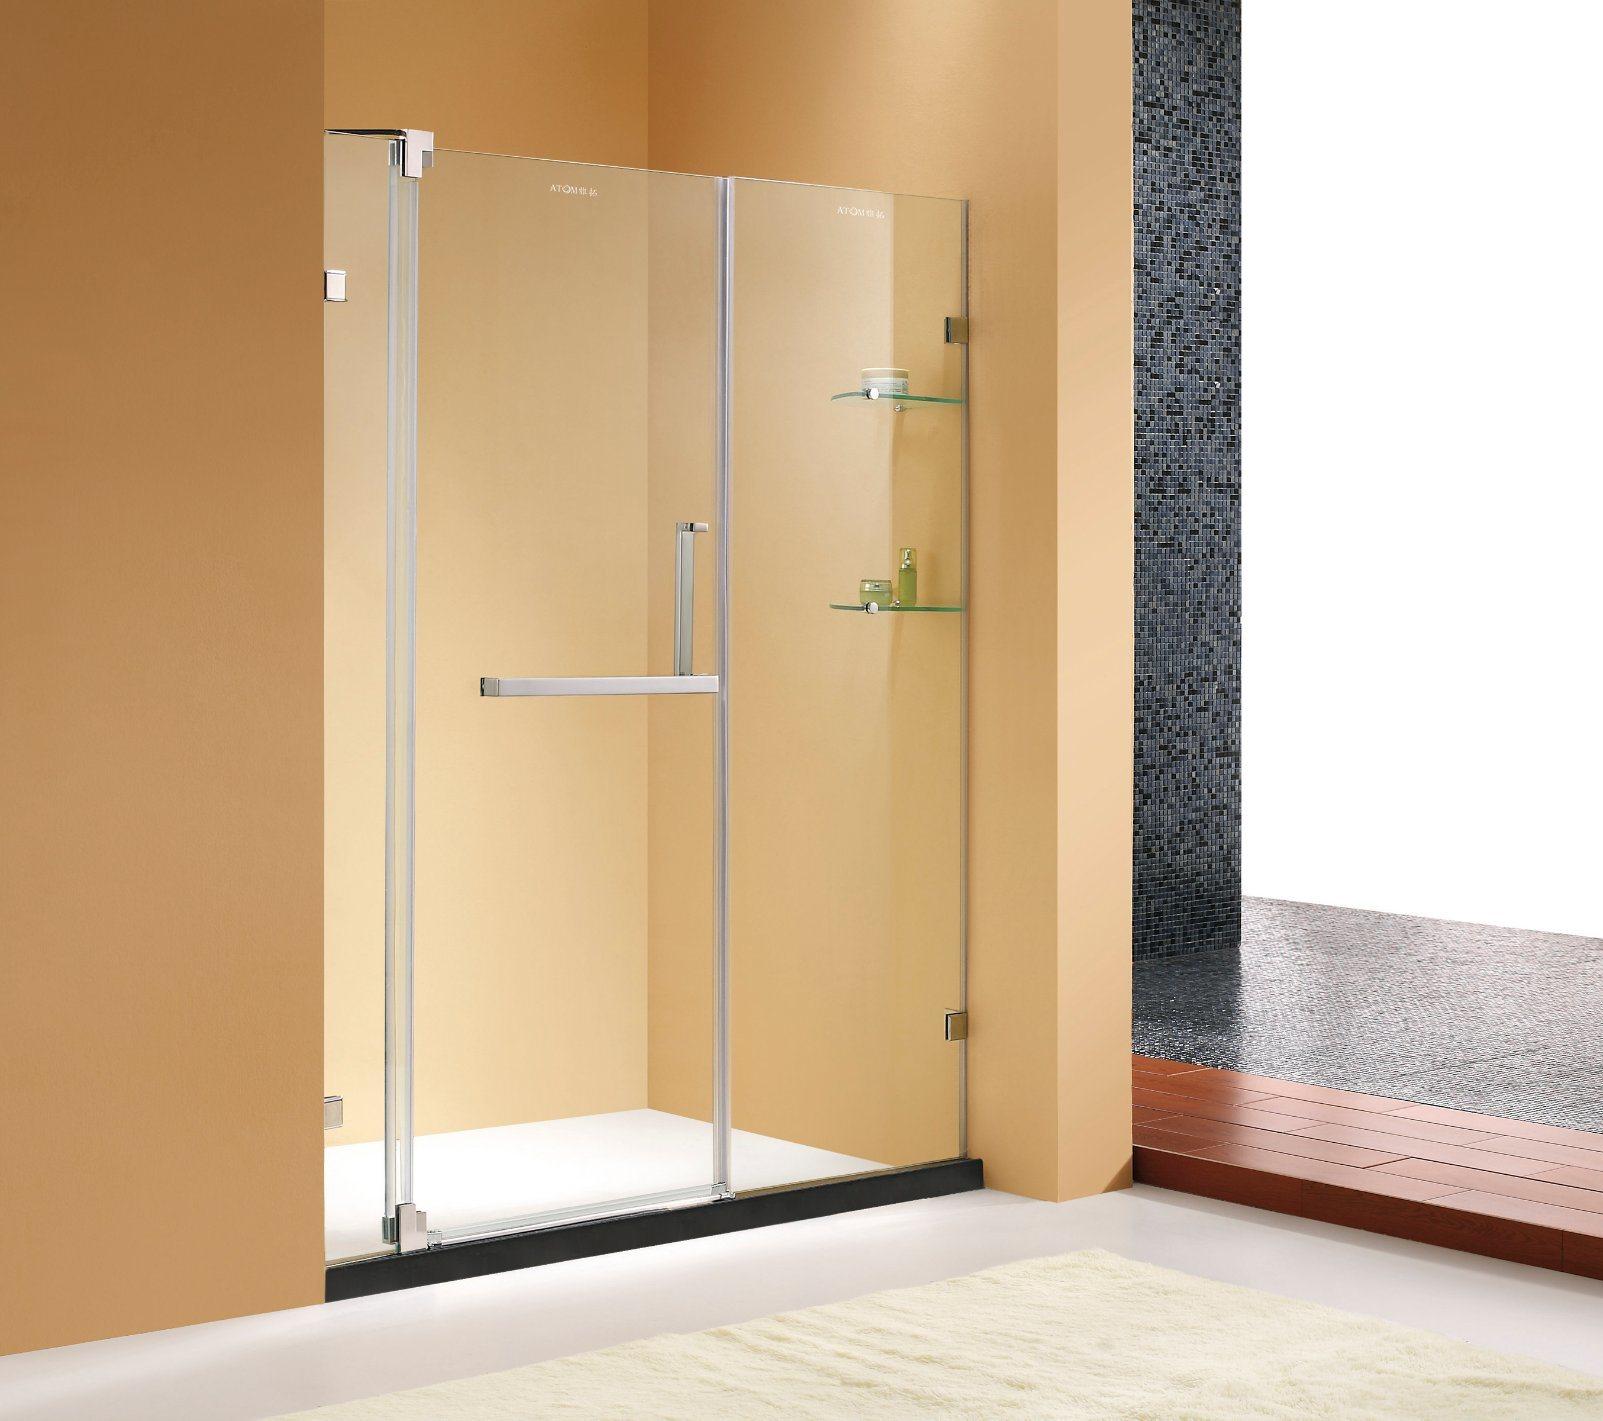 Hot Item Public Loved Frameless Pivot Shower Door Shower Screen With Tempered Glass